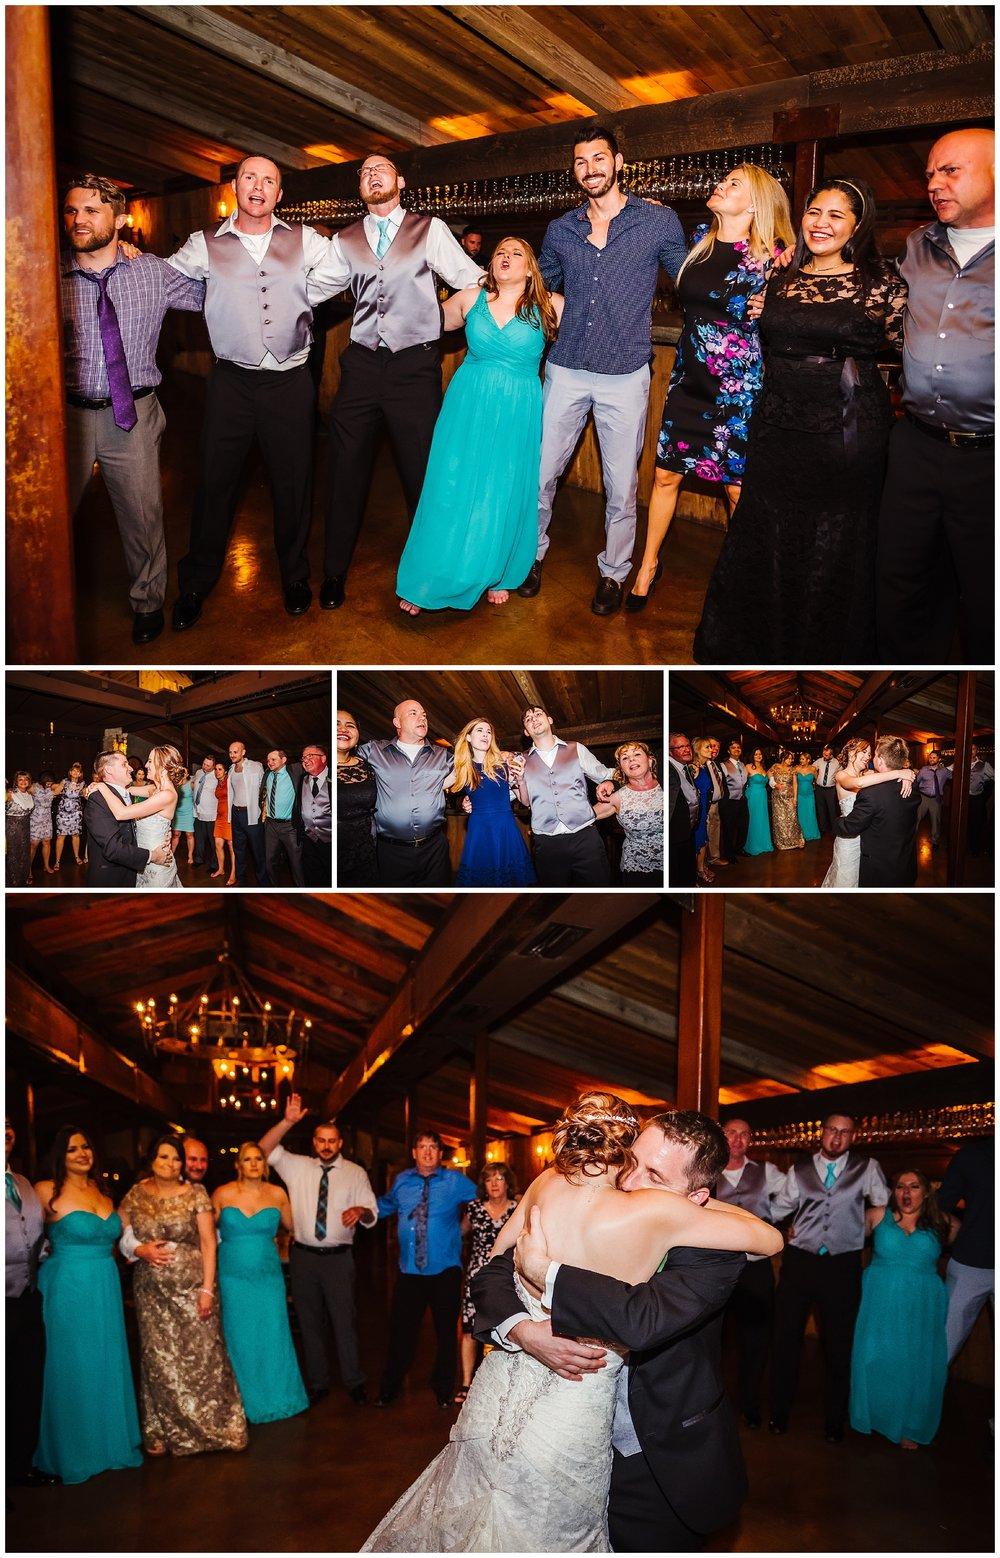 florida-destination-wedding-photographer-enchanted-tropical-miami-homestead-cooper-estate-teal_0099.jpg